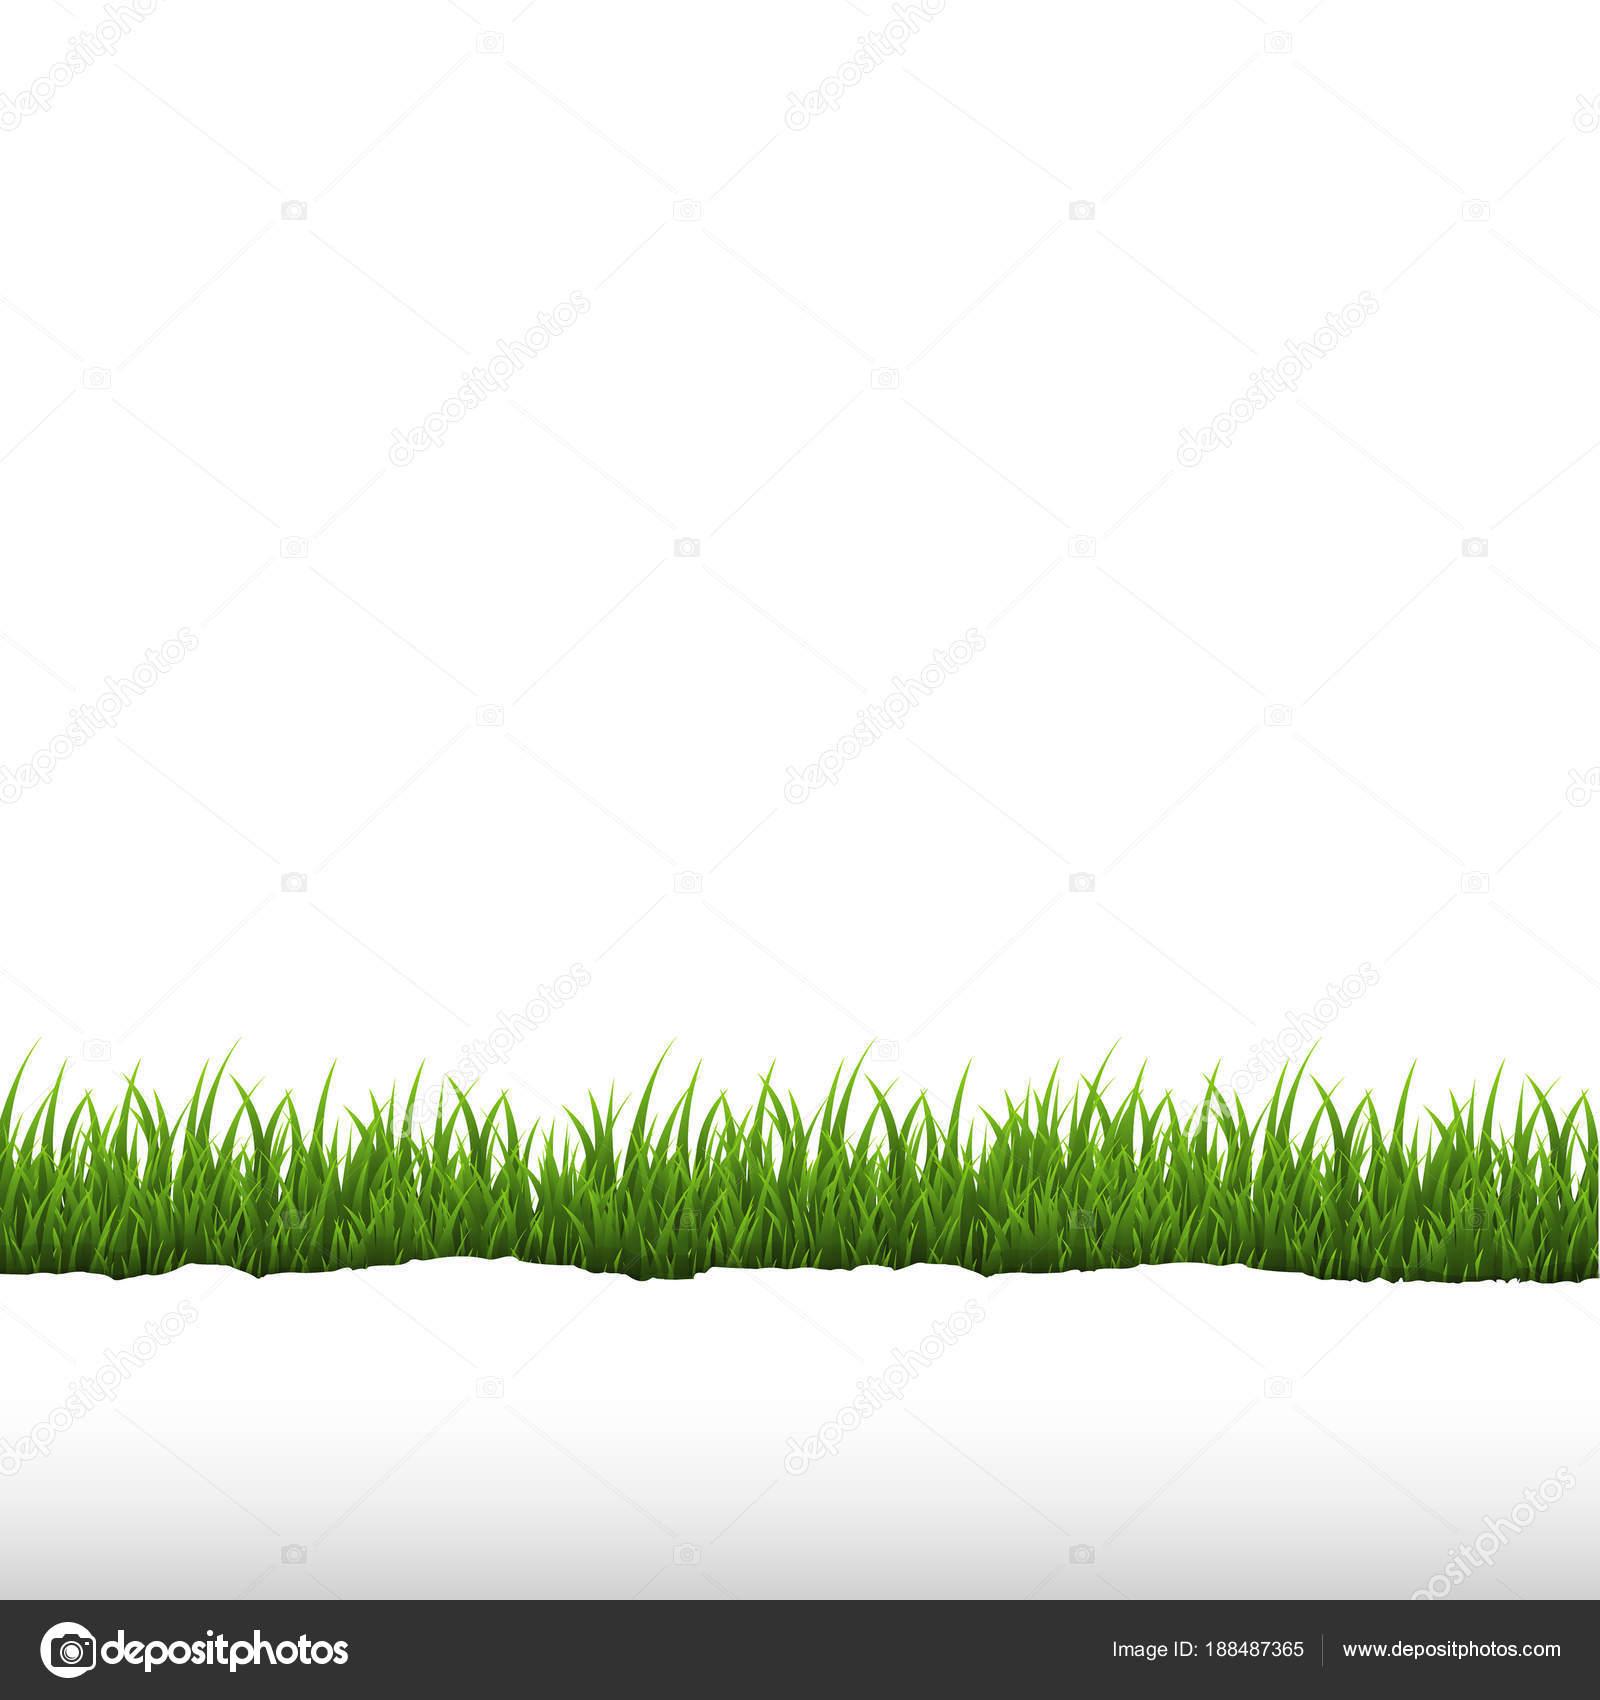 Grass Transparent Background Throughout Green Grass Ripped Paper Border Transparent Background Gradient Mesh Vector Stock